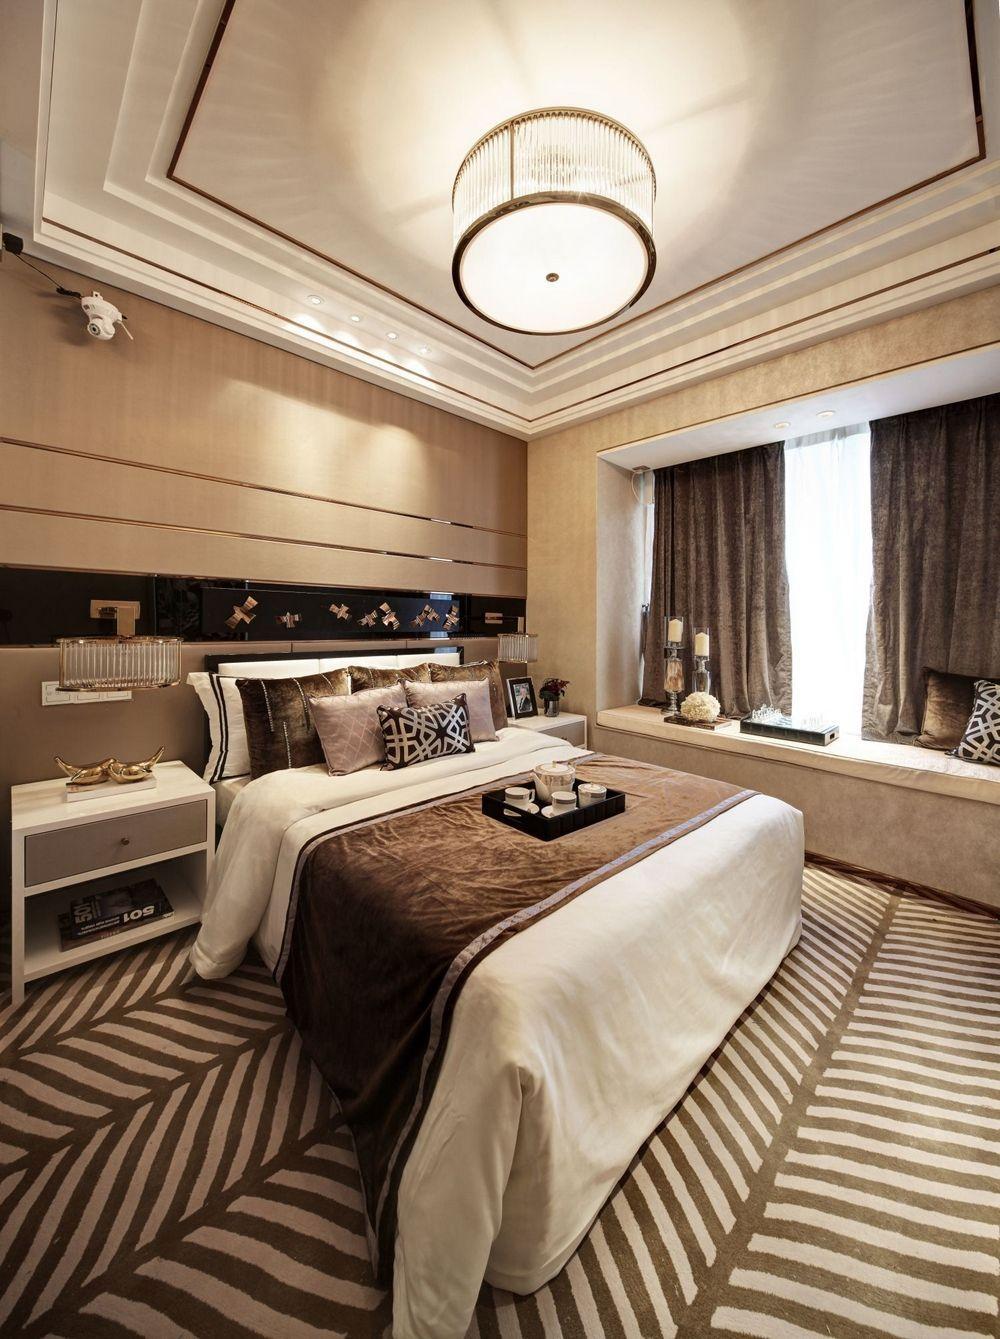 Contemporary interior designs interior design college - Master degree in interior design ...